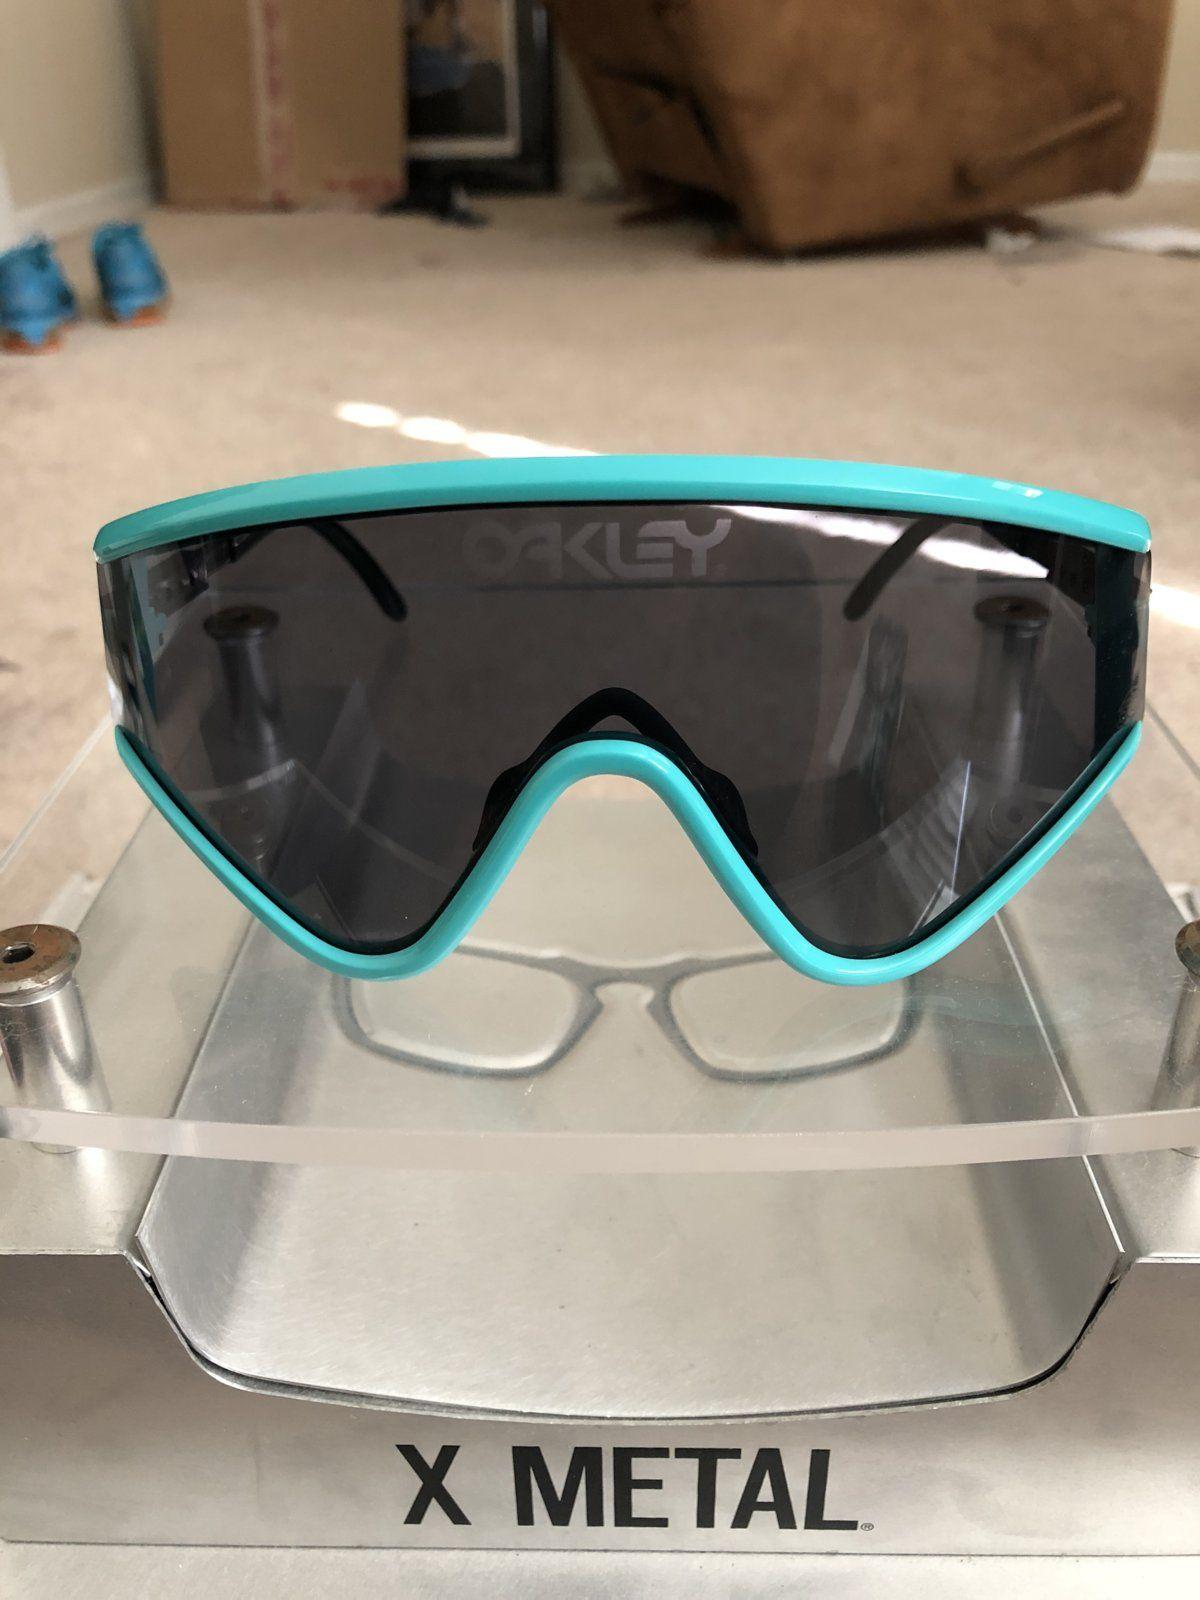 15 pairs for sale (new stuff-part 1) - D2CC9C63-177D-430C-933C-8620A69F7224.jpeg